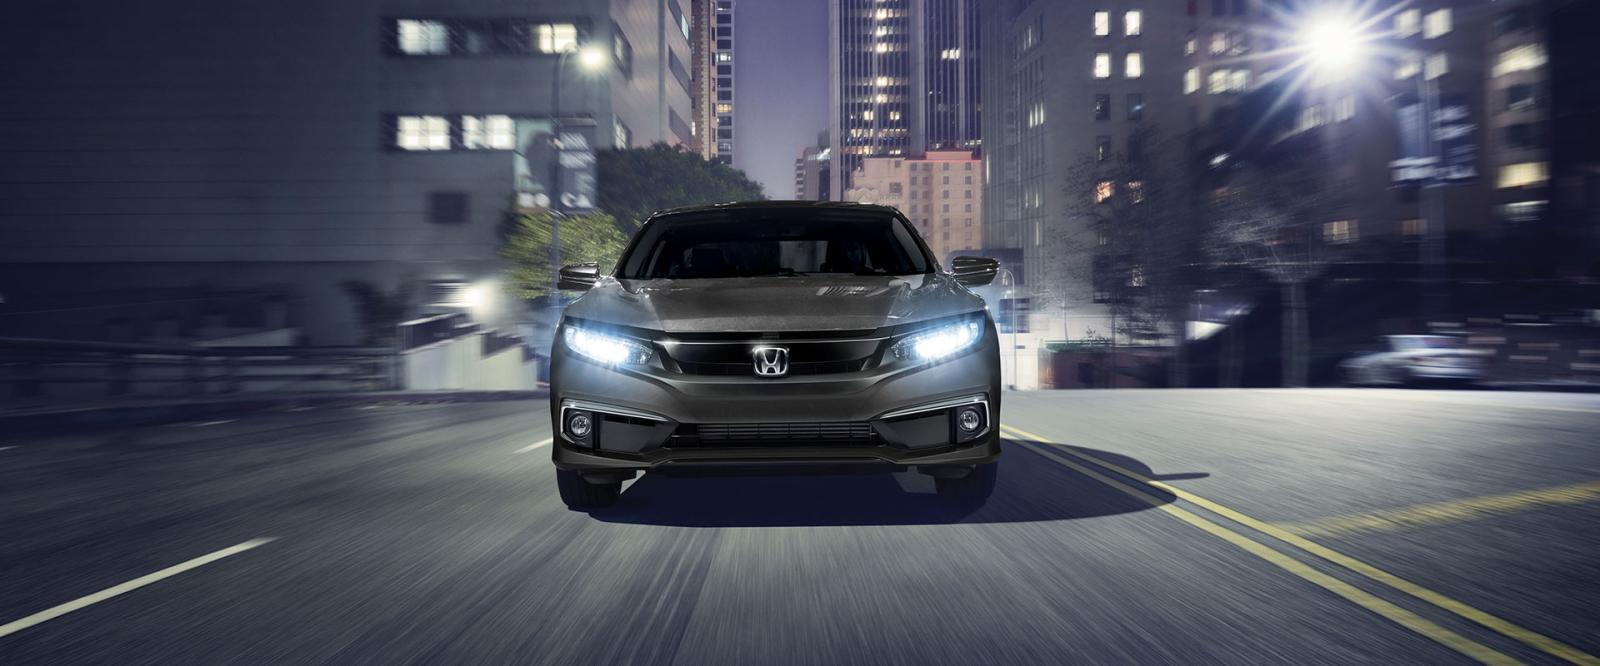 Honda Civic Precio 7